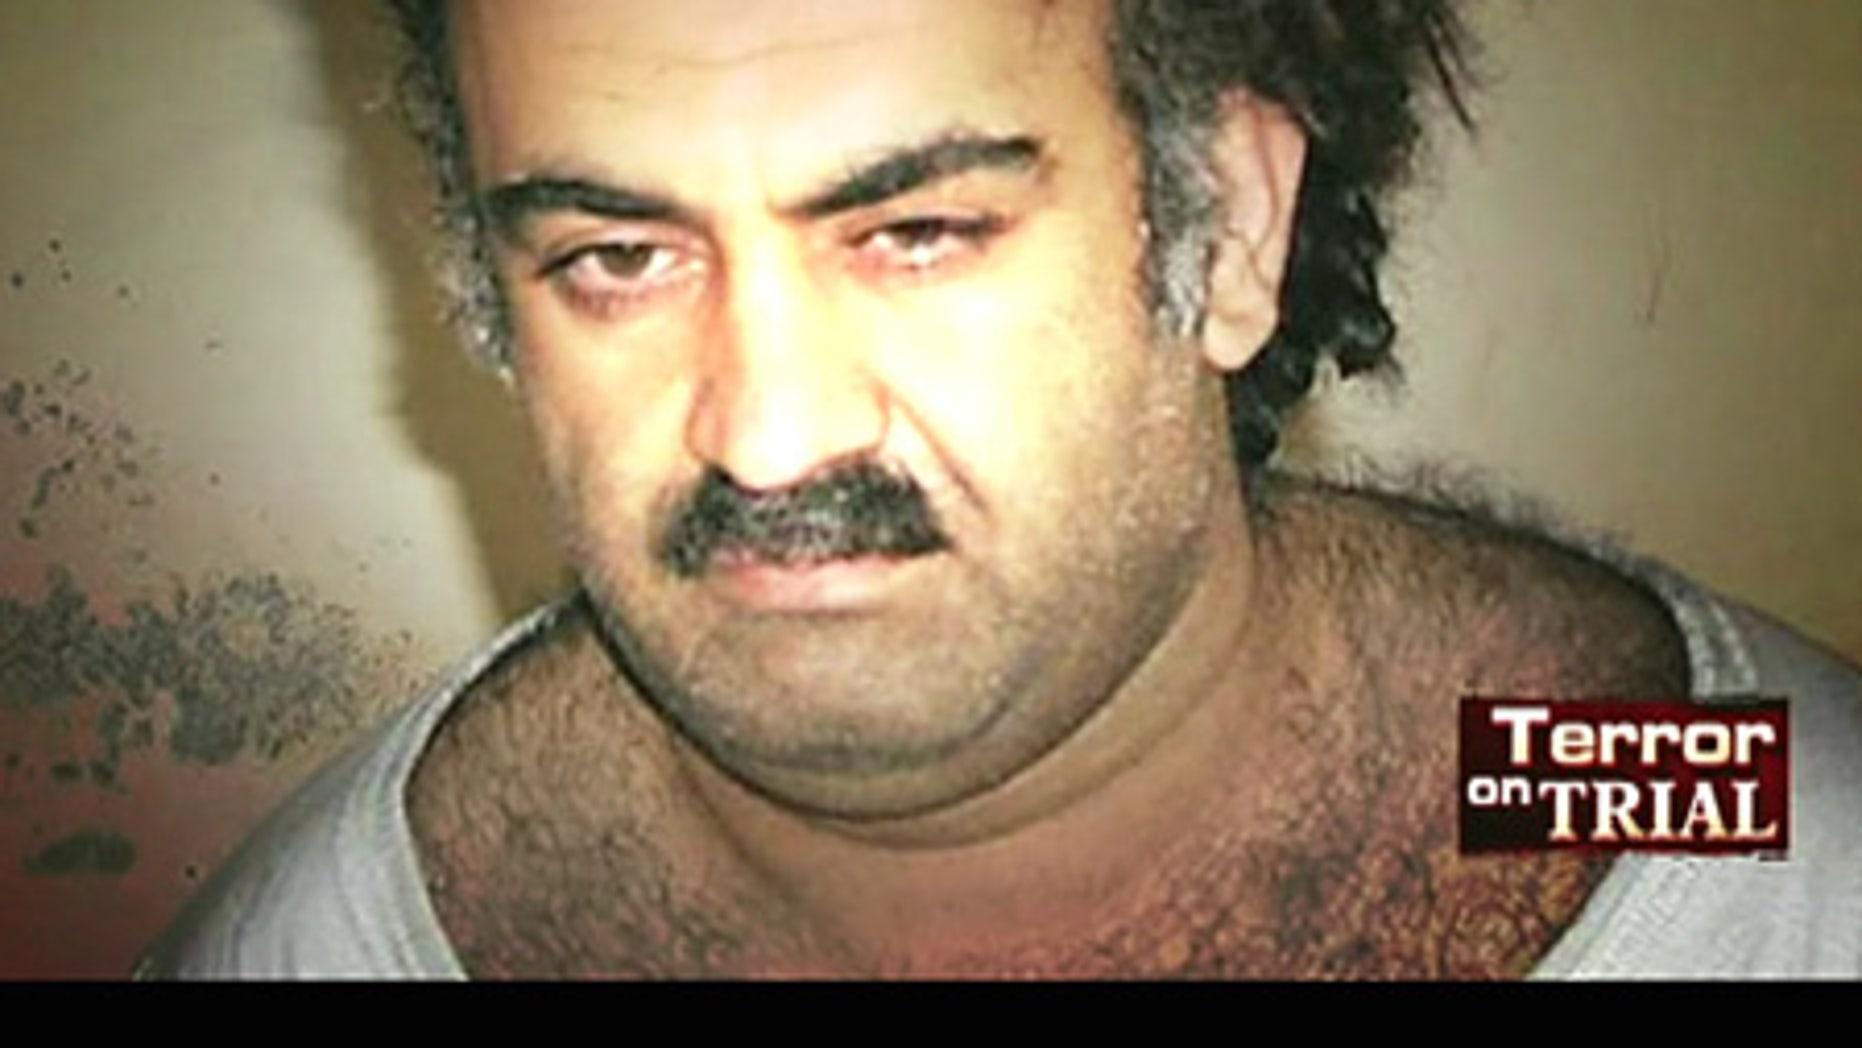 Self-proclaimed 9/11 mastermind Khalid Sheikh Mohammed